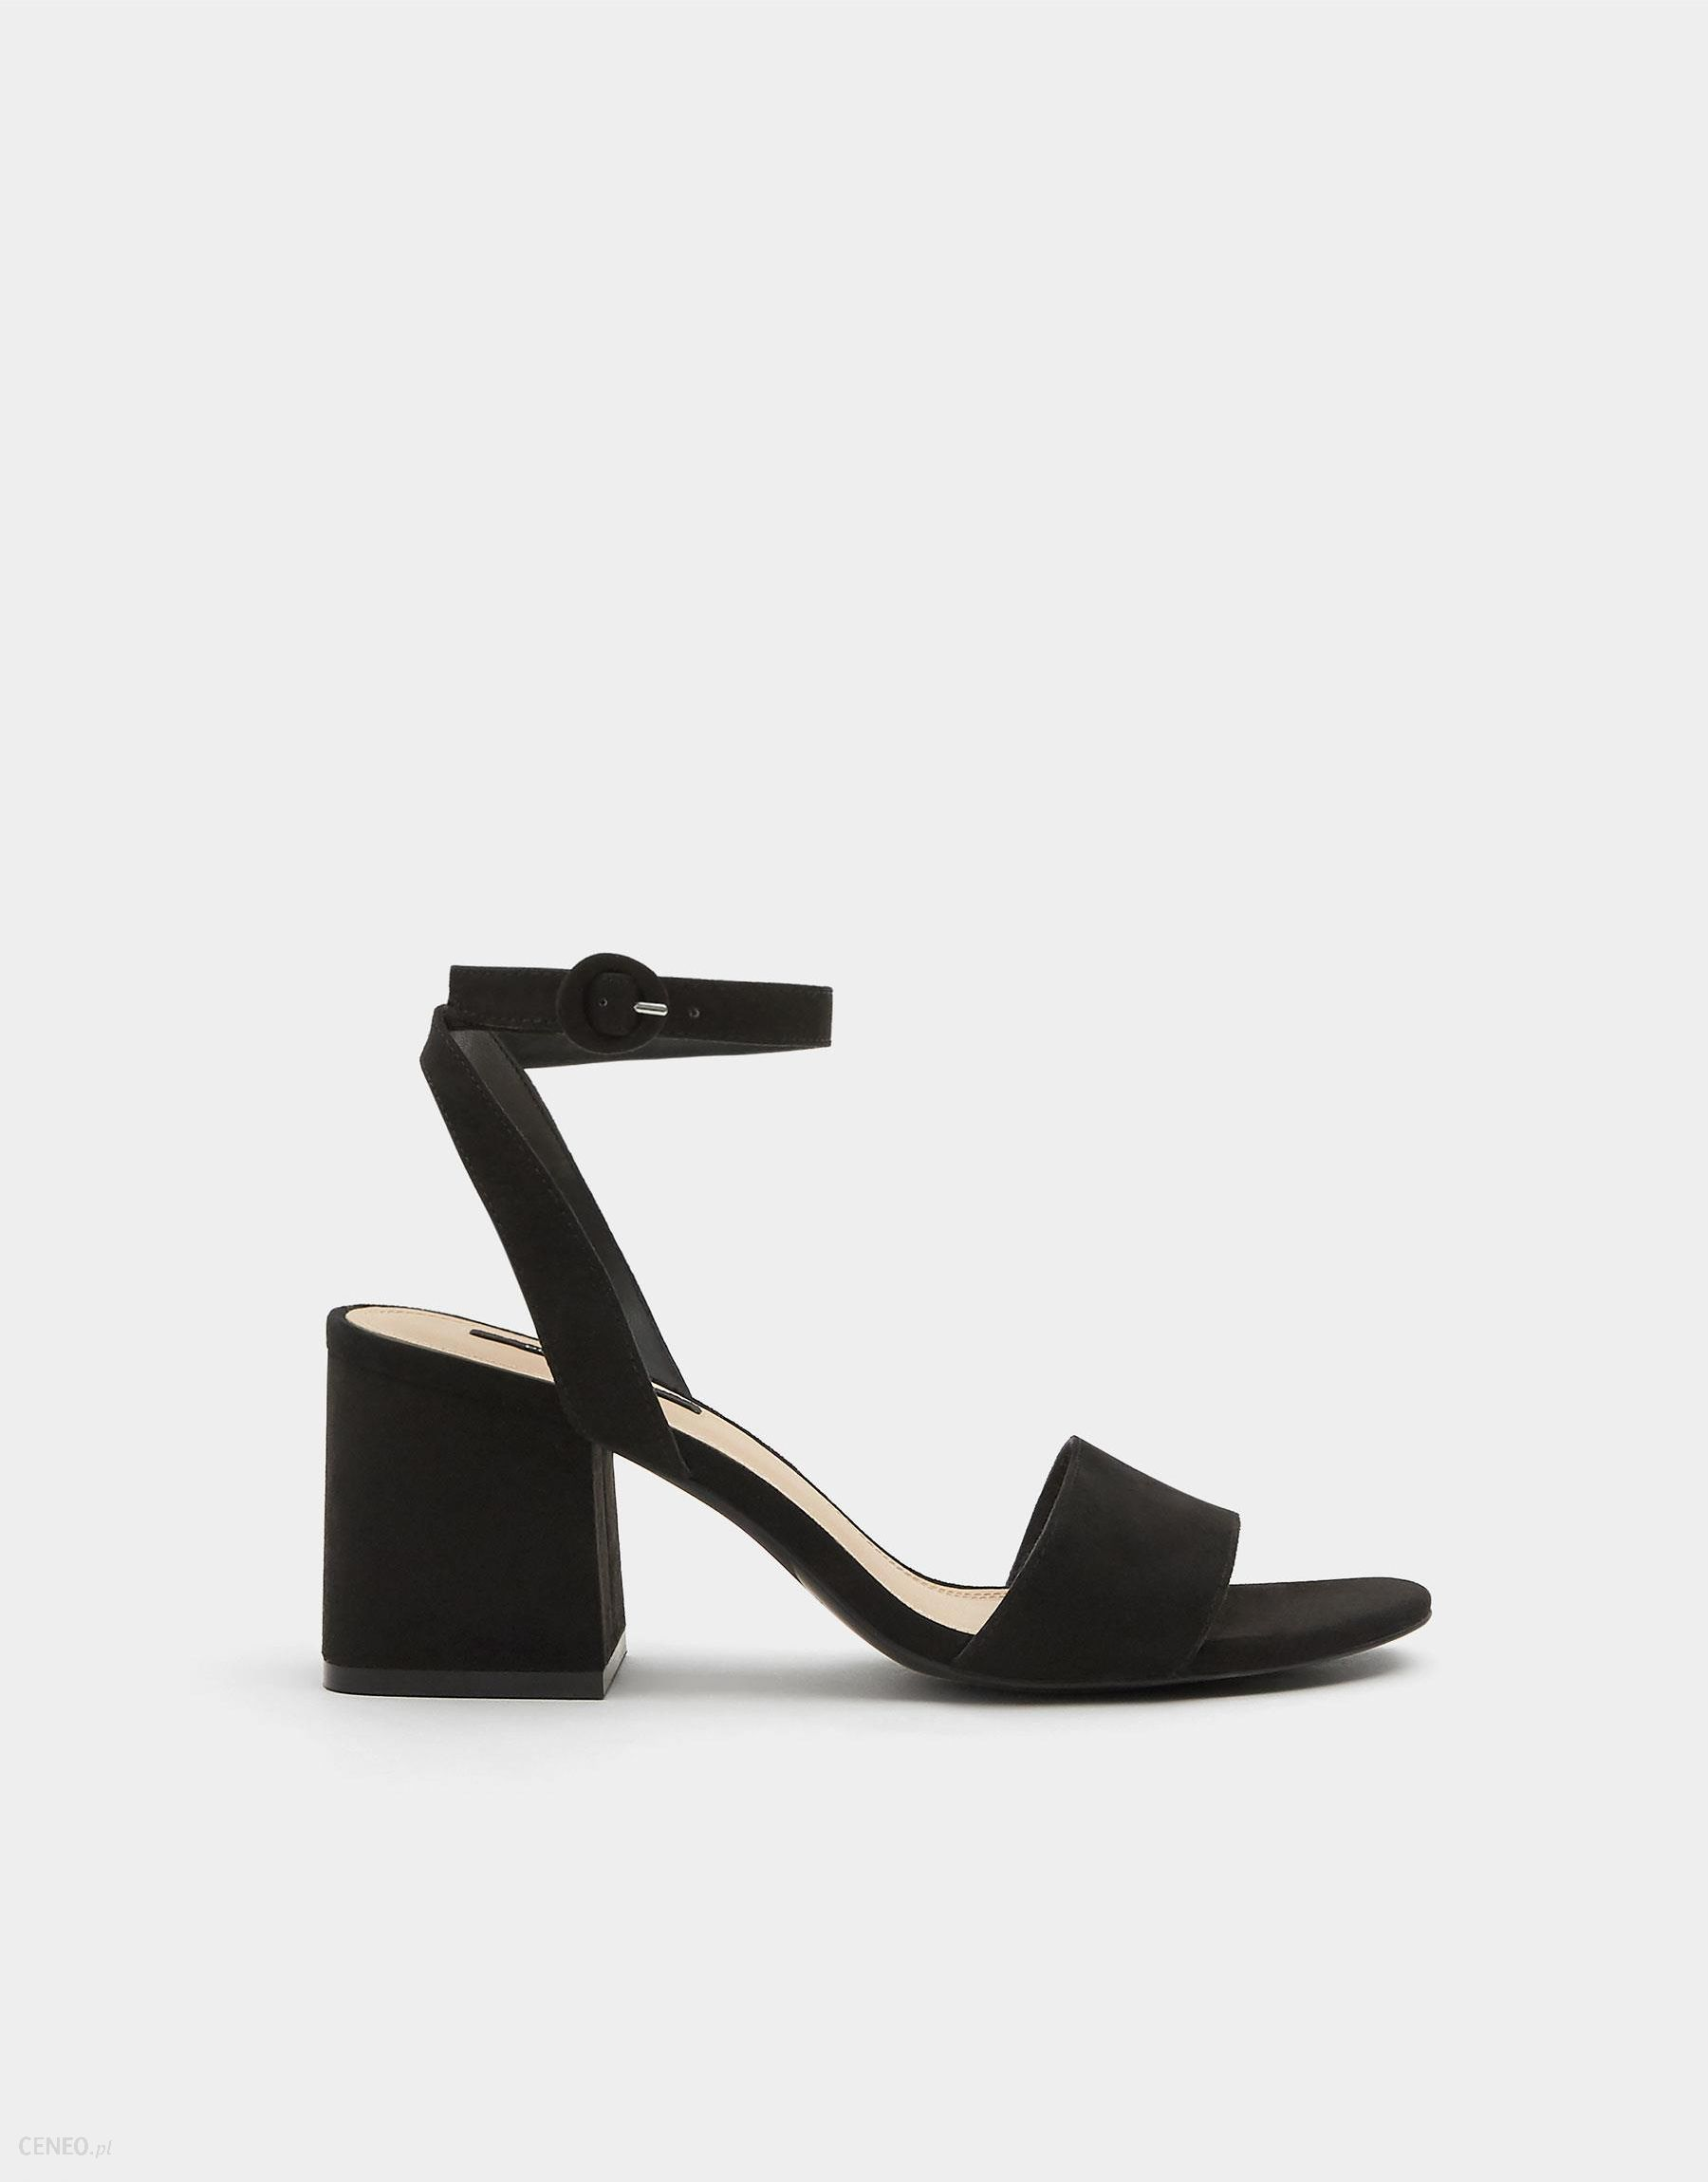 Czarne sandały zapinane wokół kostki Lampert 539 | Modema.pl